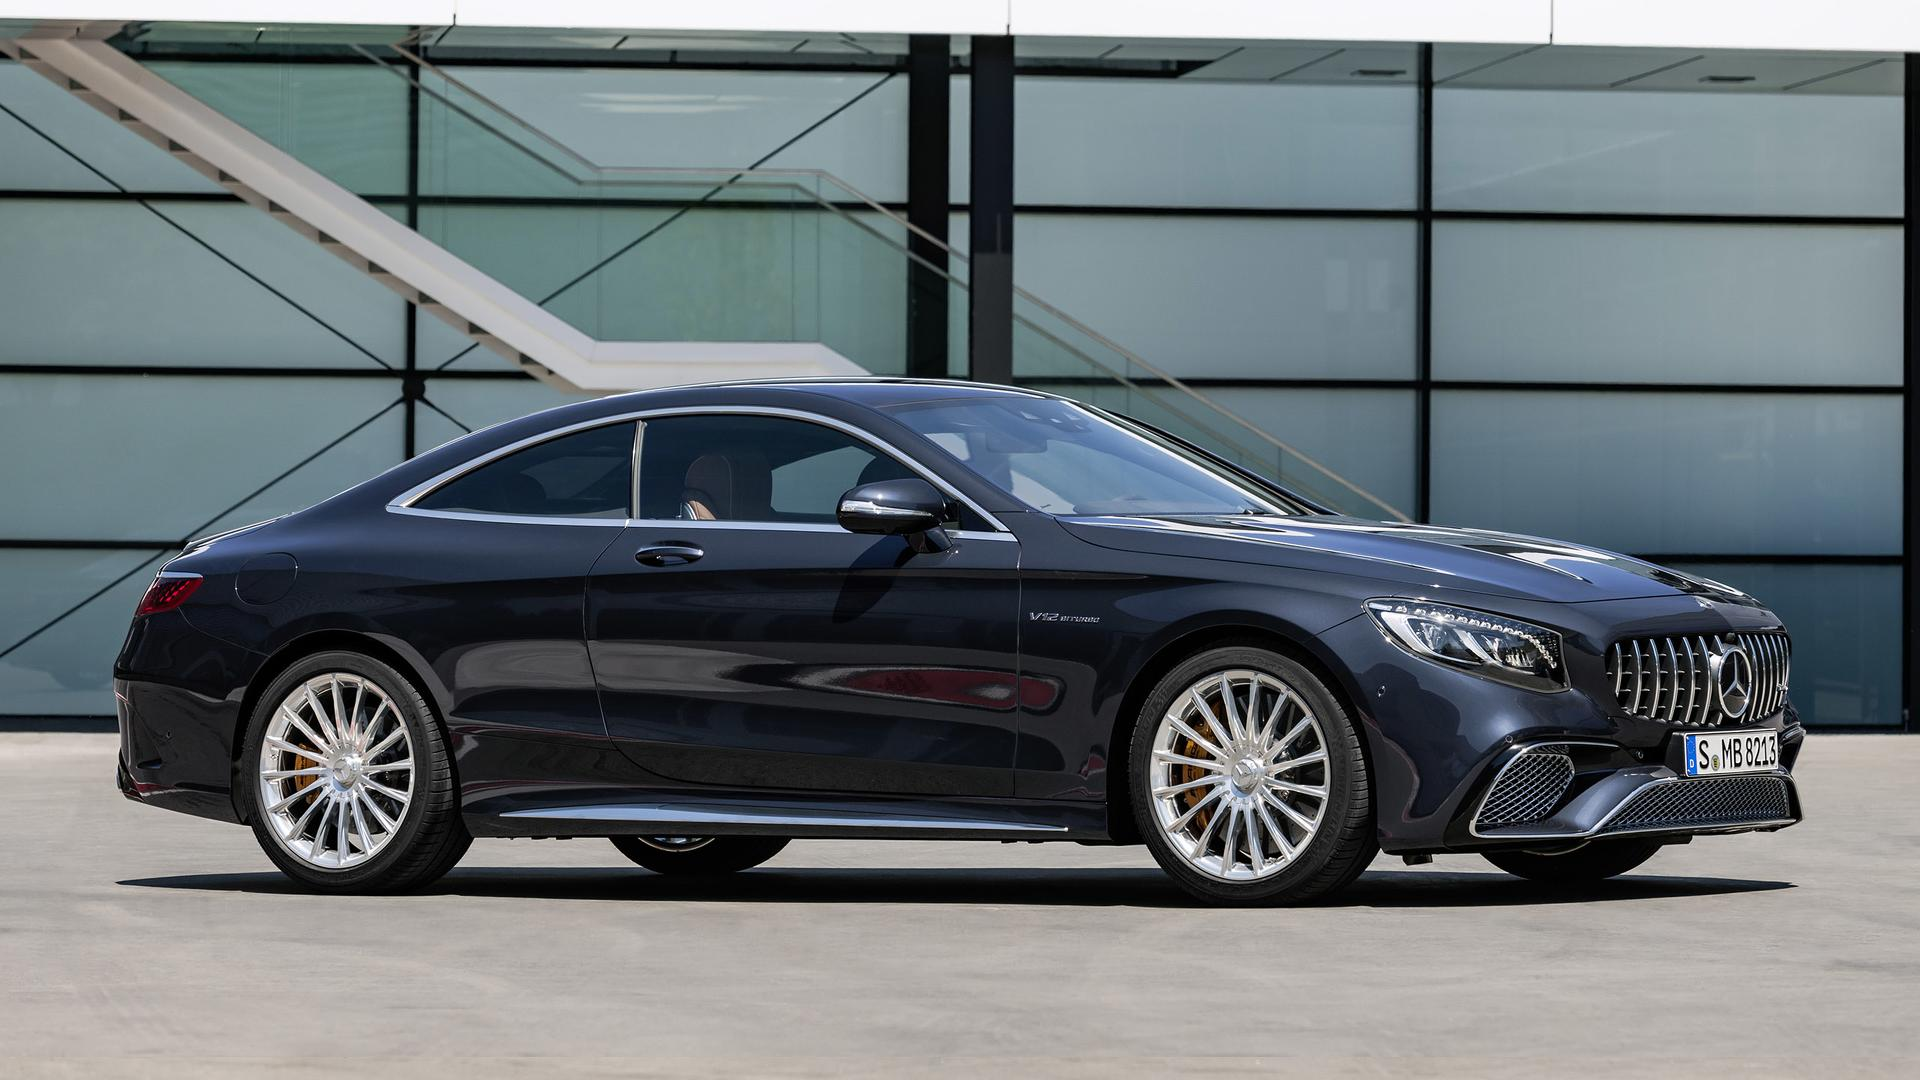 Mercedes Benz S Class Coupe Reveals Its Frankfurt Facelift